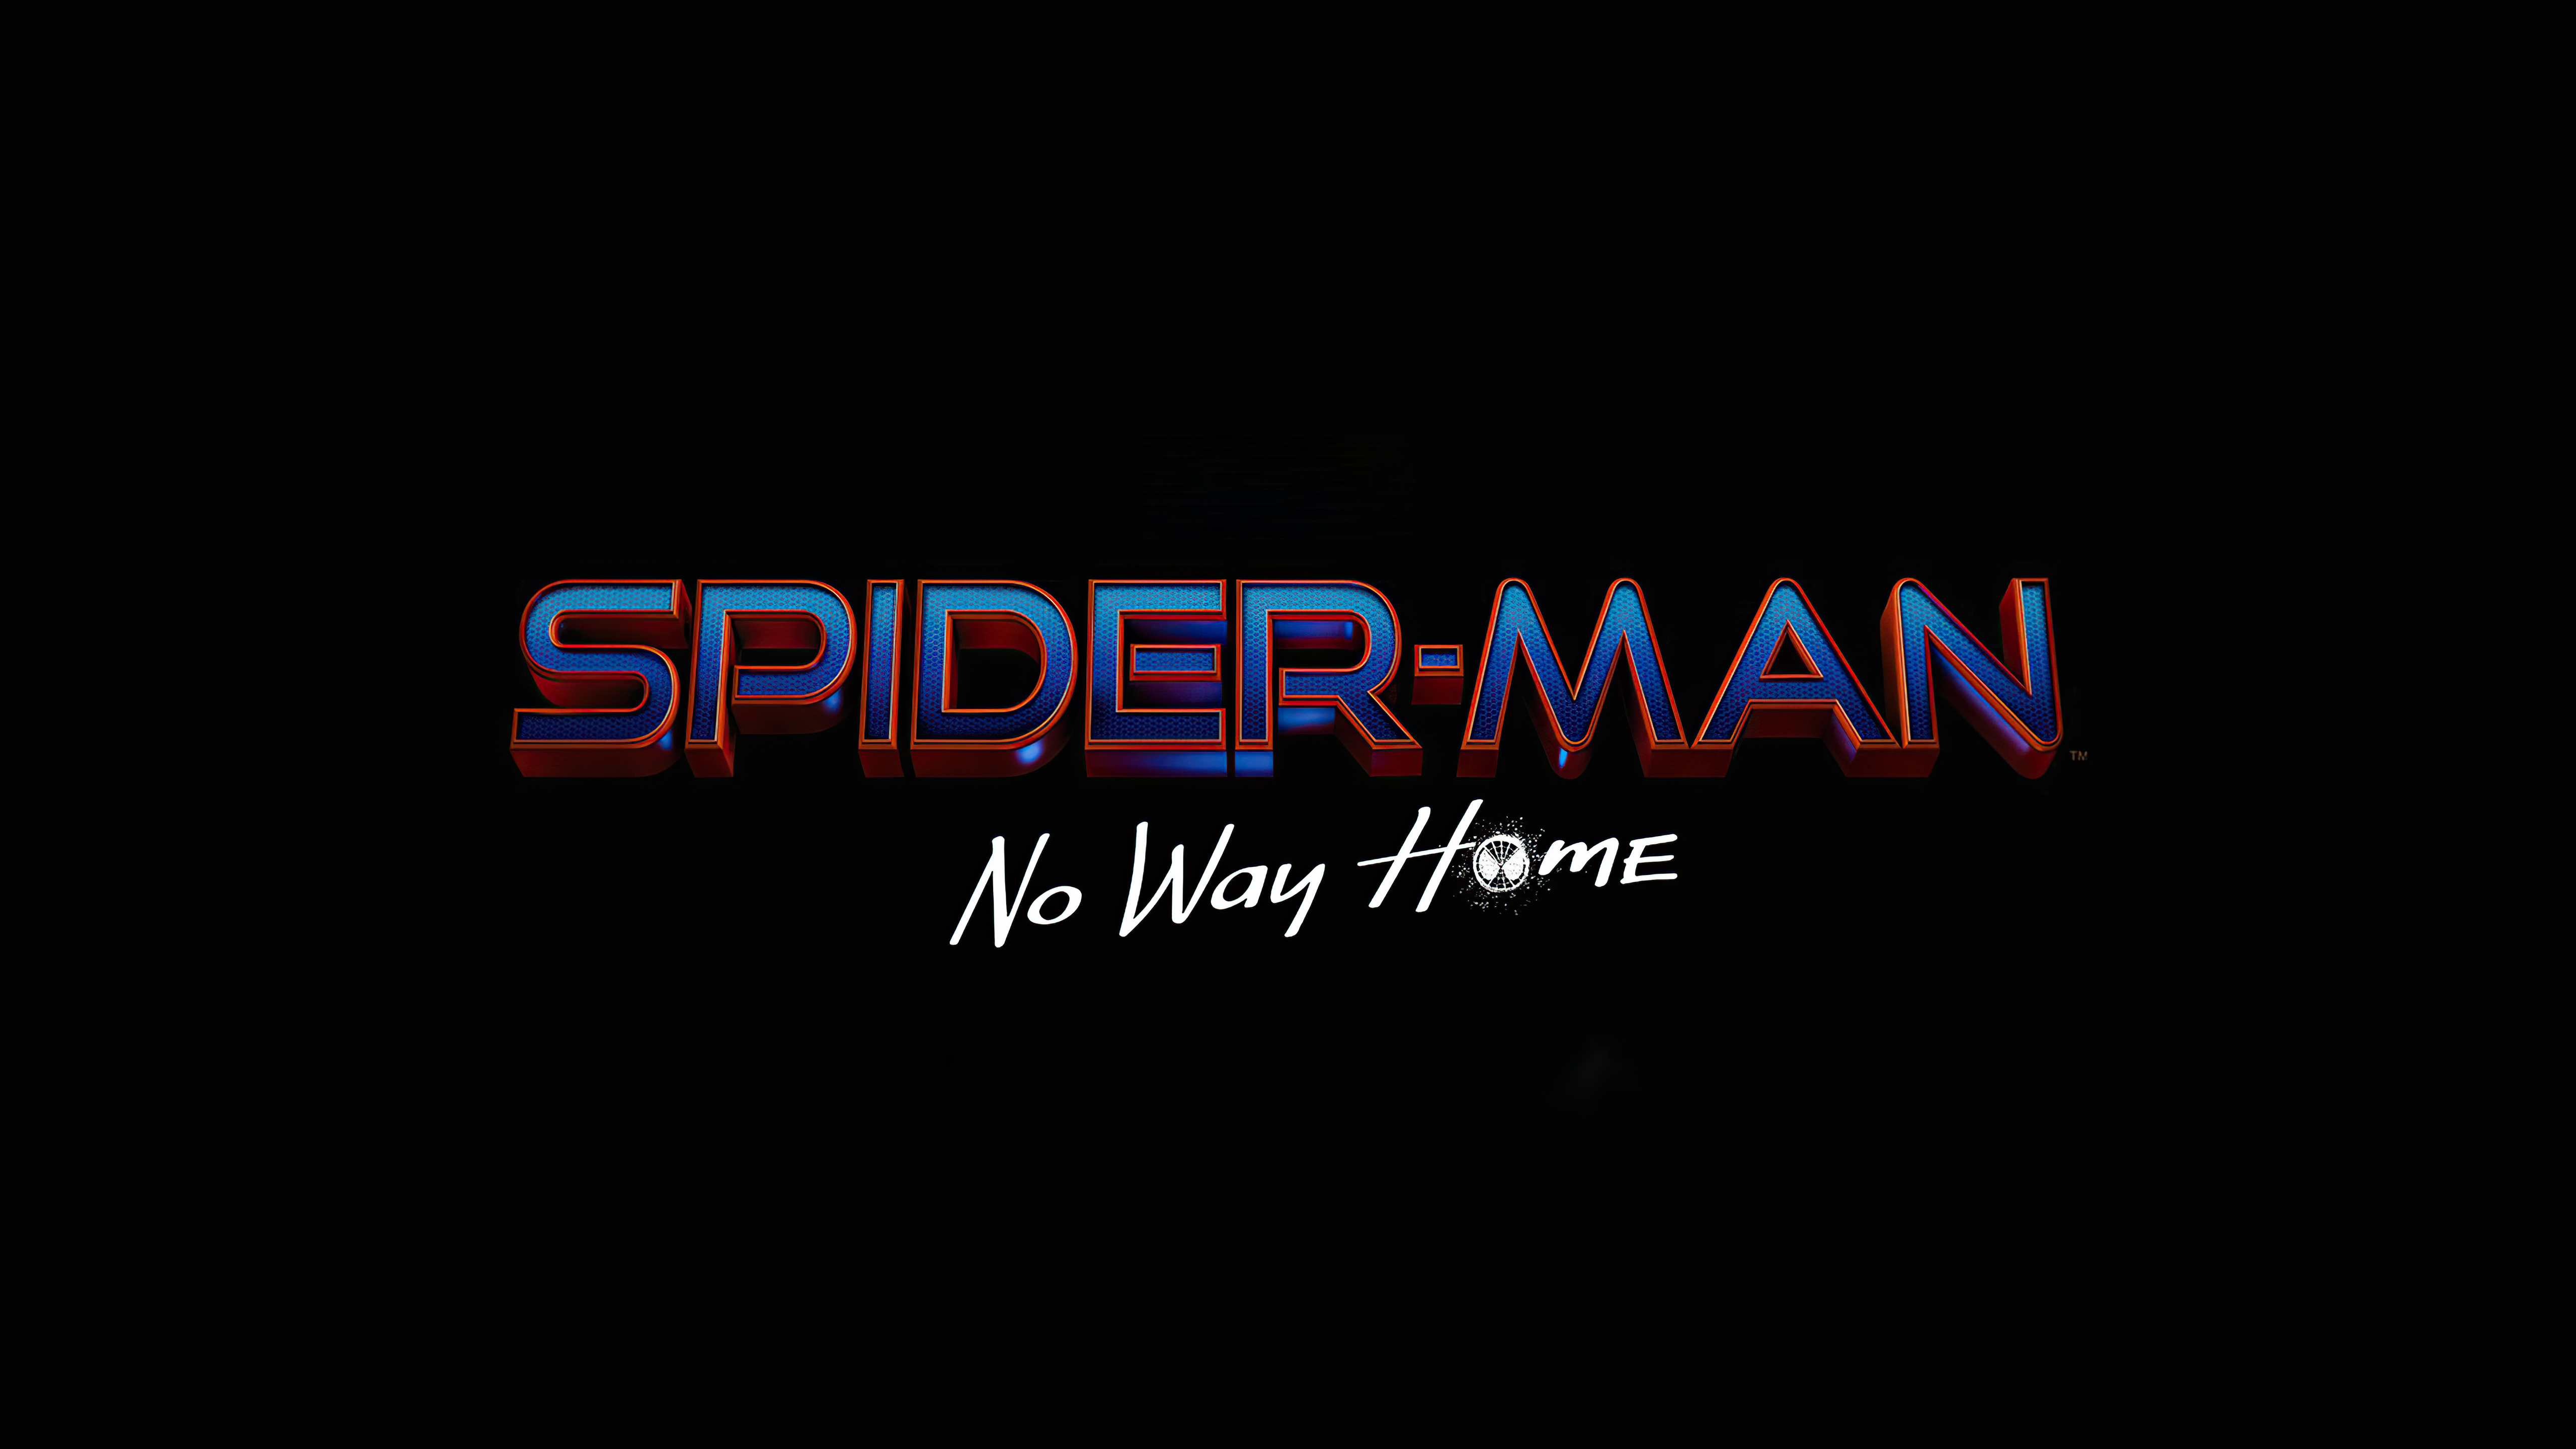 spider man no way home 4k 1618165473 - Spider Man No Way Home 4k - Spider Man No Way Home 4k wallpapers